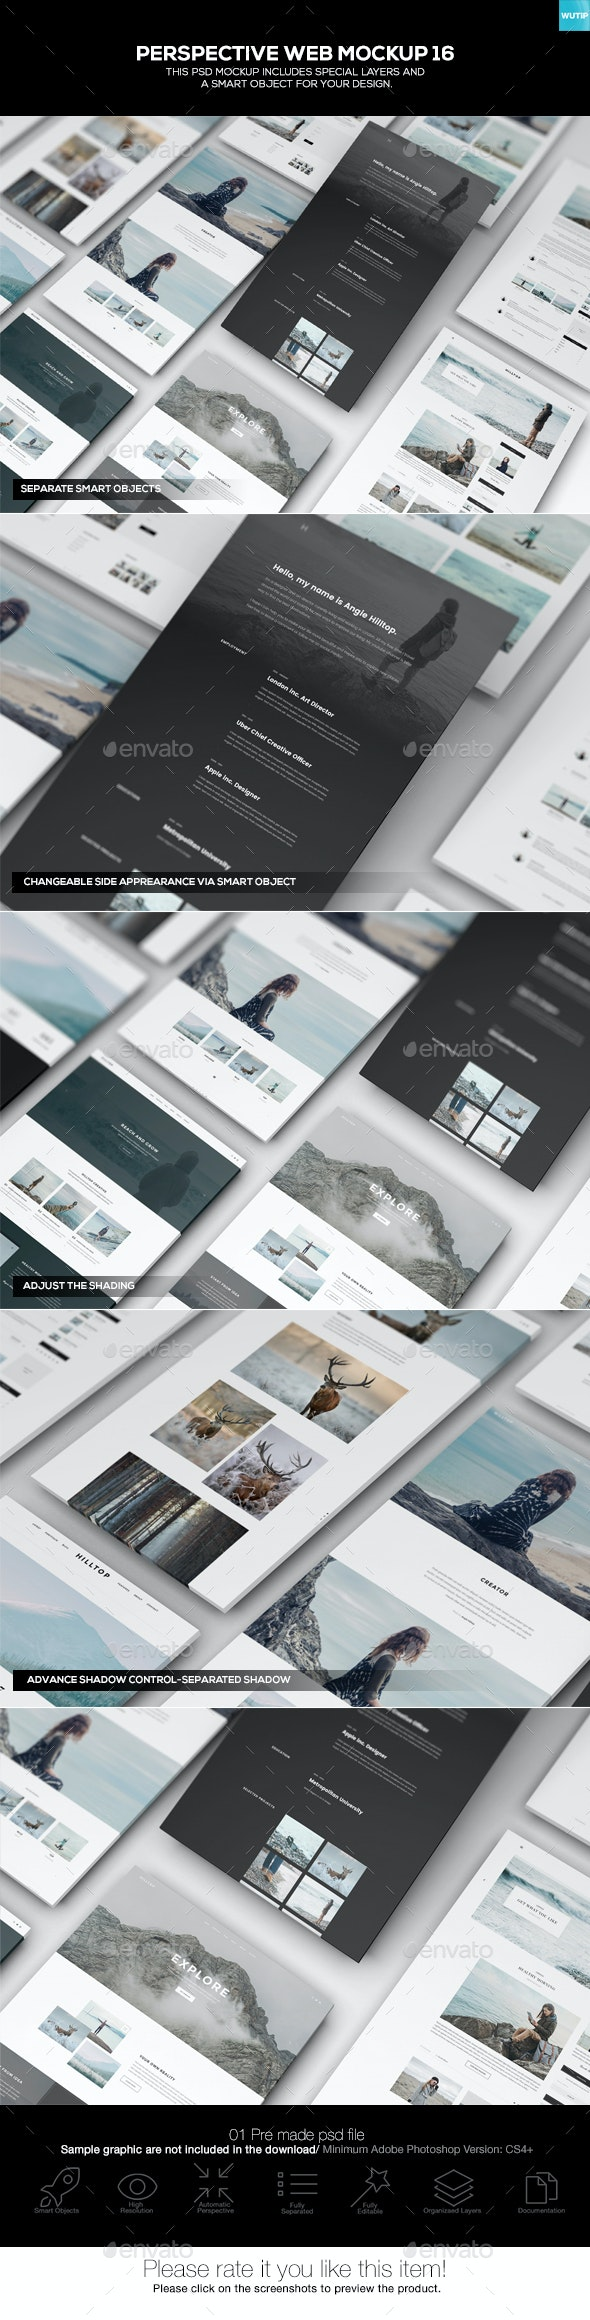 Perspective Web Mockup 16 - Website Displays